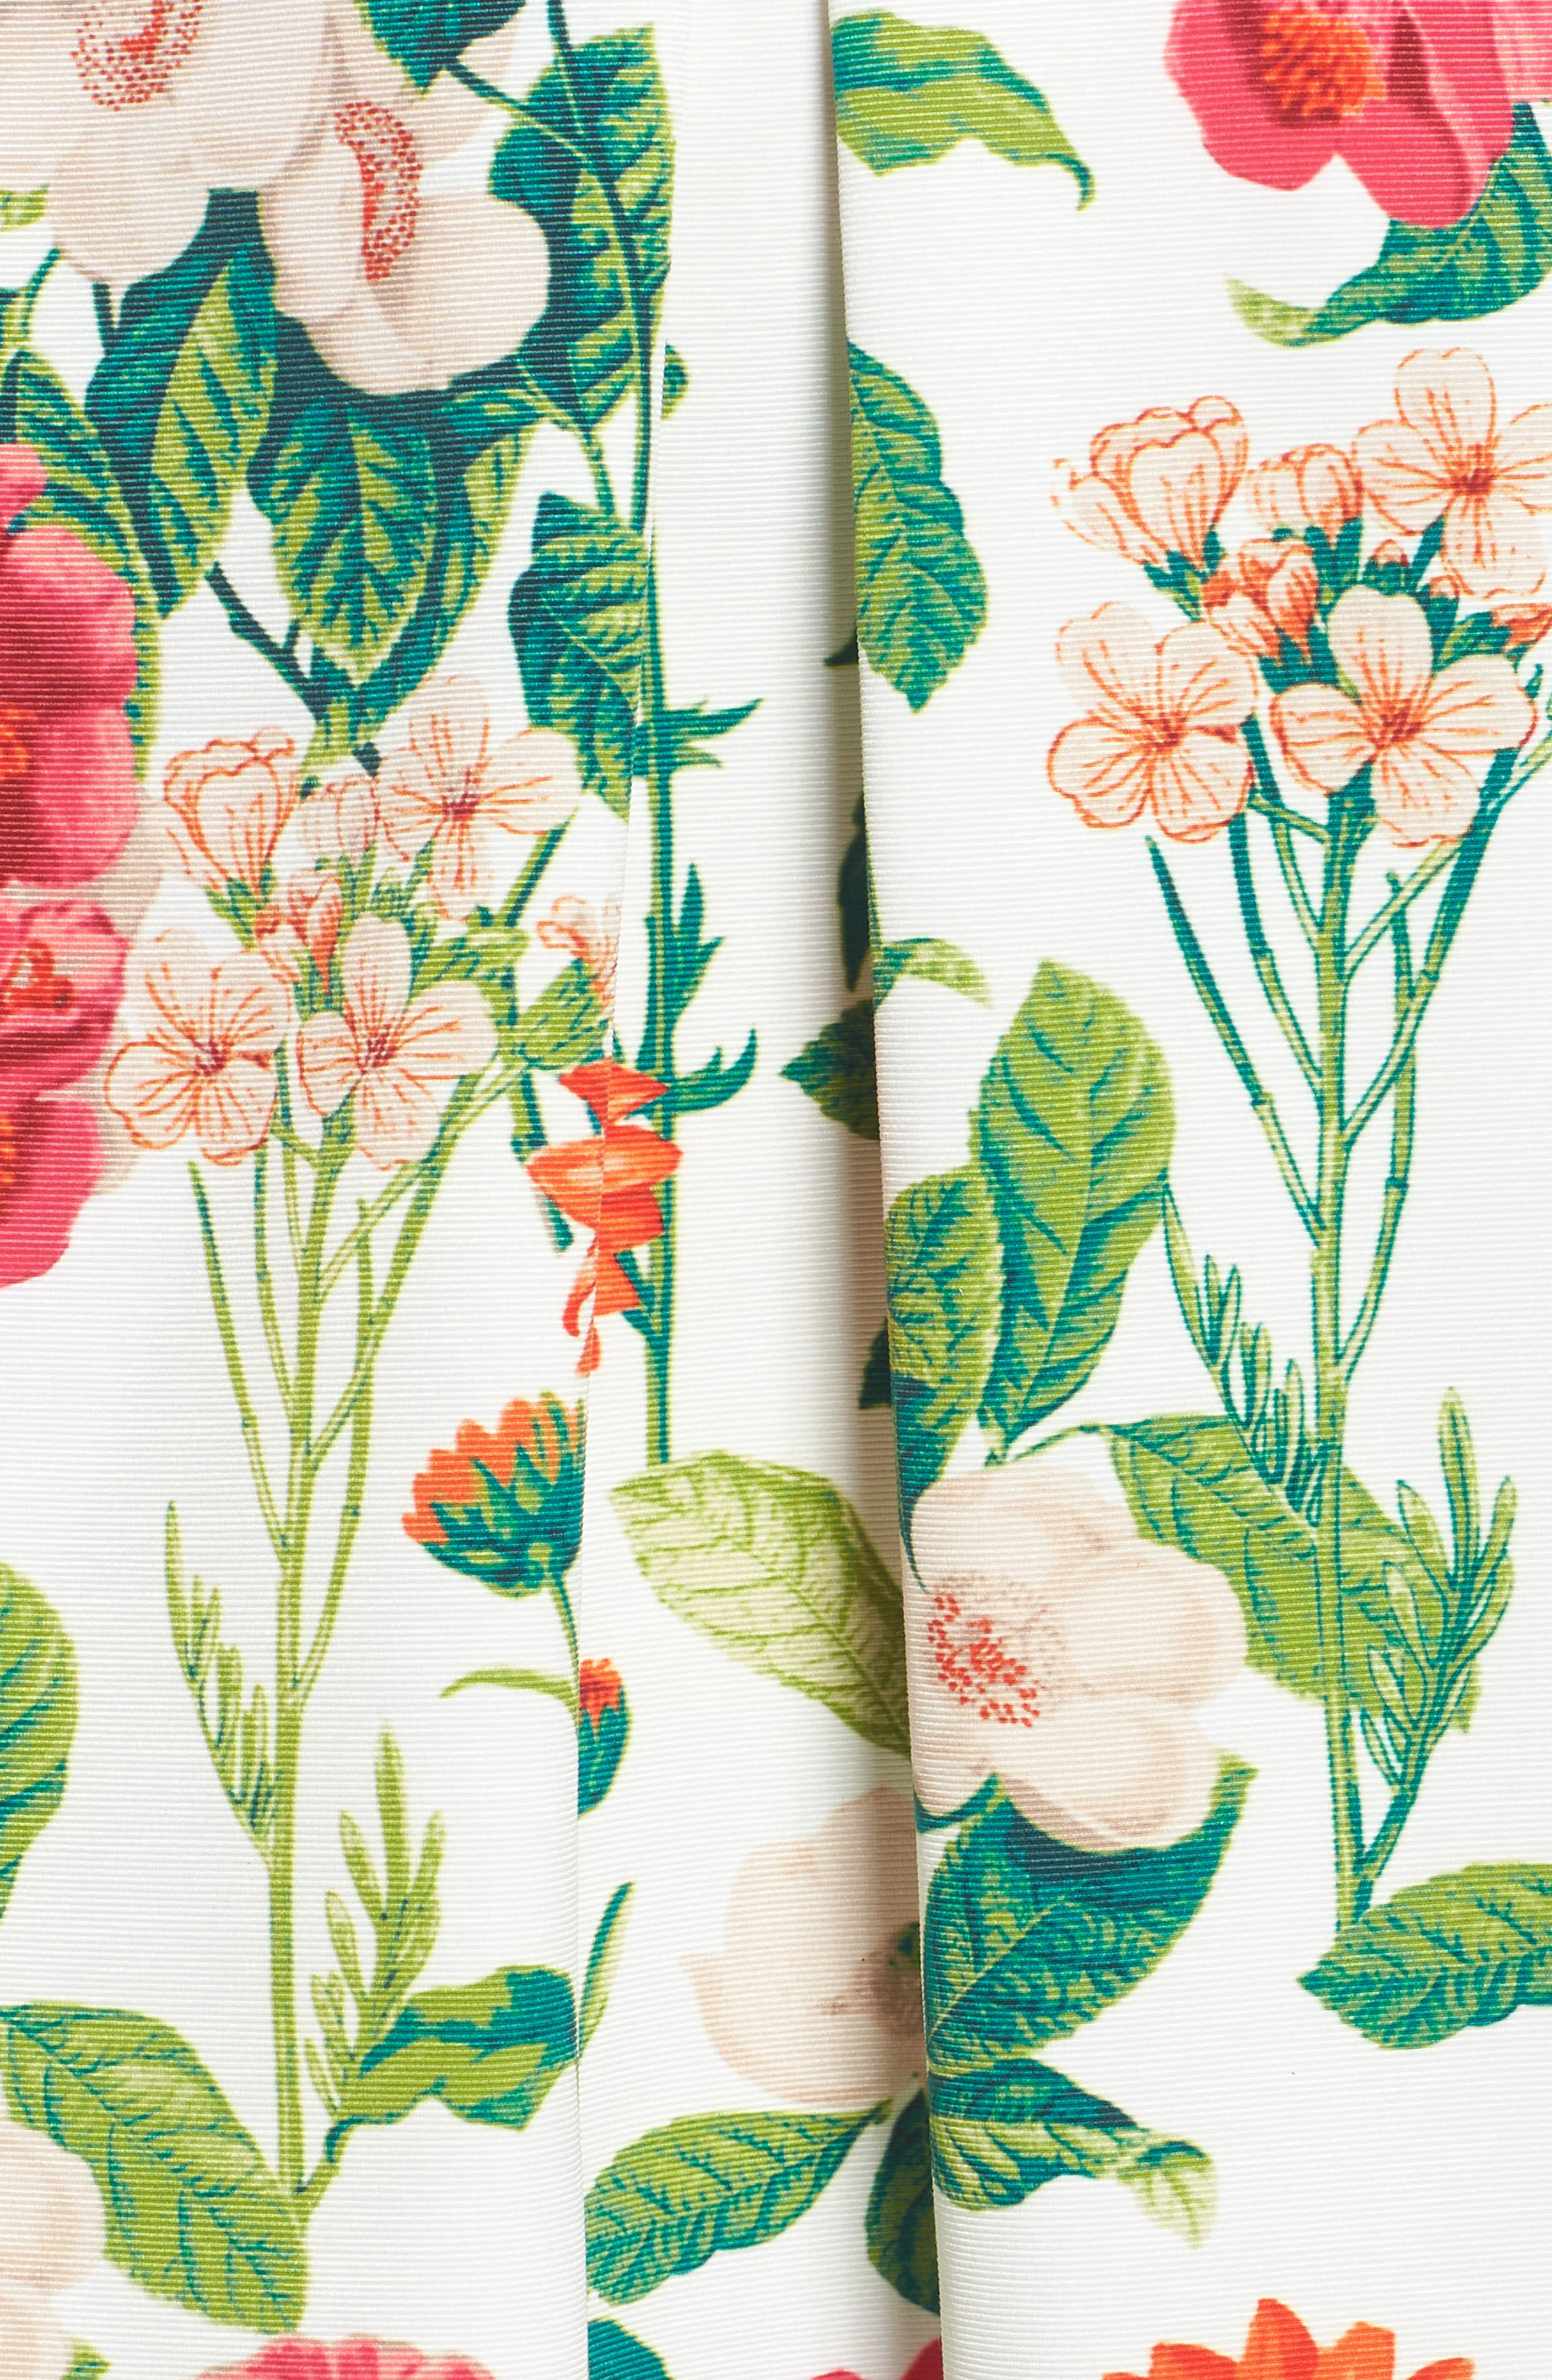 Floral A-Line Skirt,                             Alternate thumbnail 5, color,                             901